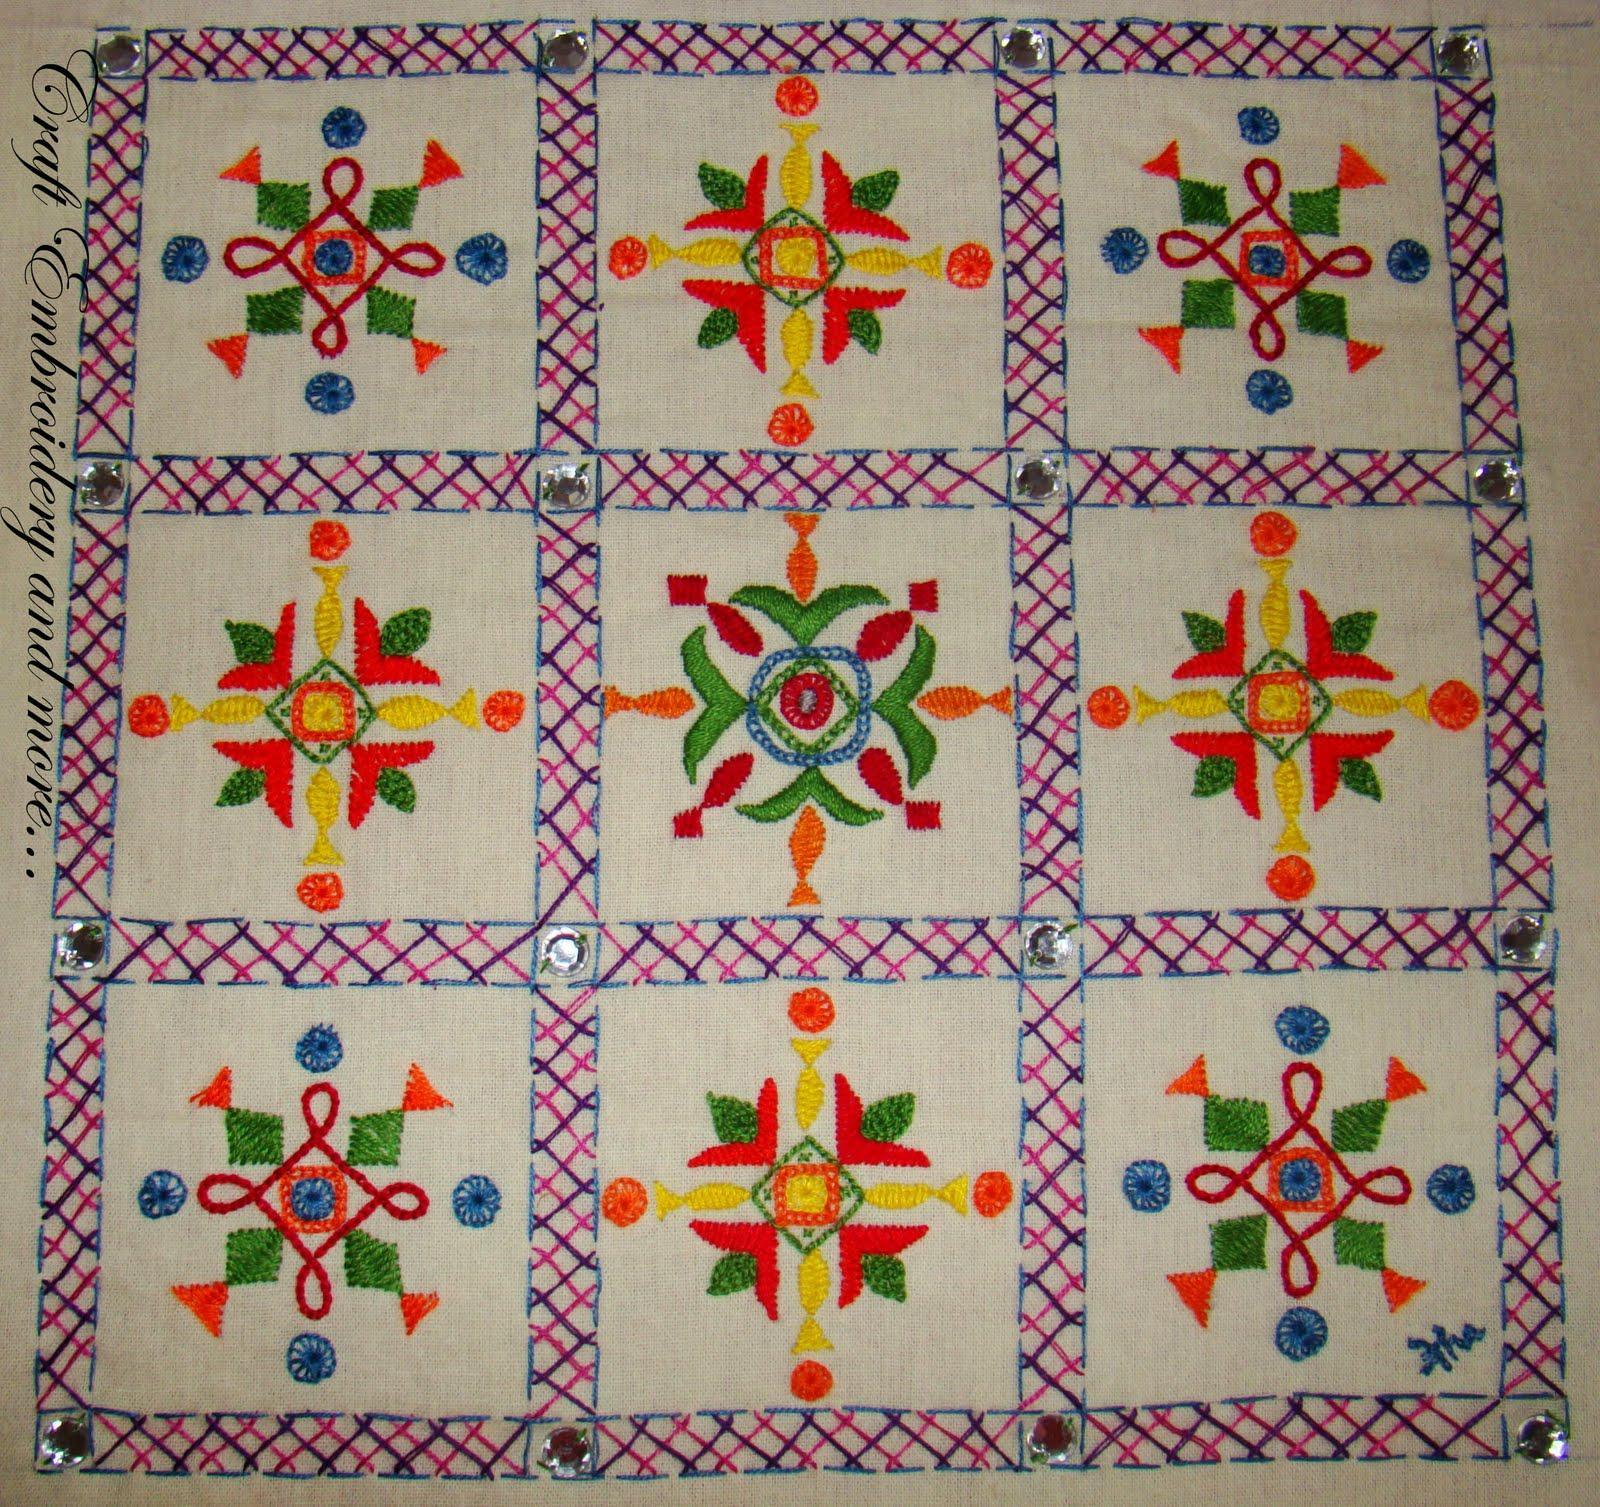 Gujarati Embroidery Motifs | Makaroka.com